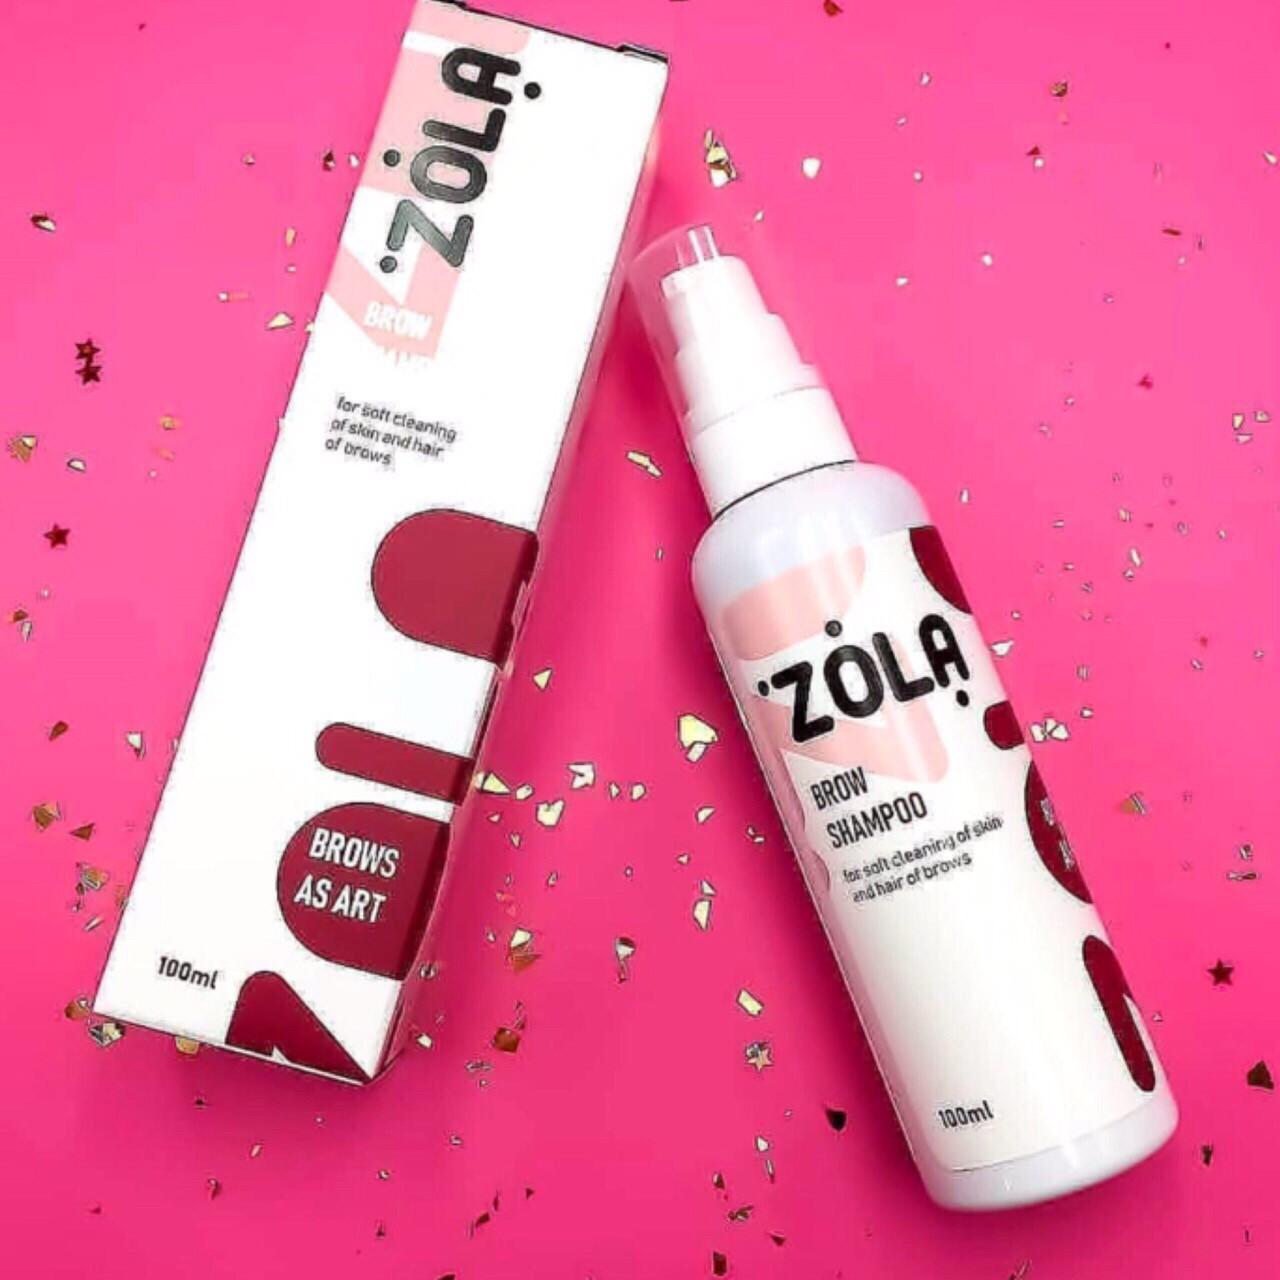 "Шампунь для бровей (Brow Shampoo) ""ZOLA"", 100 мл"